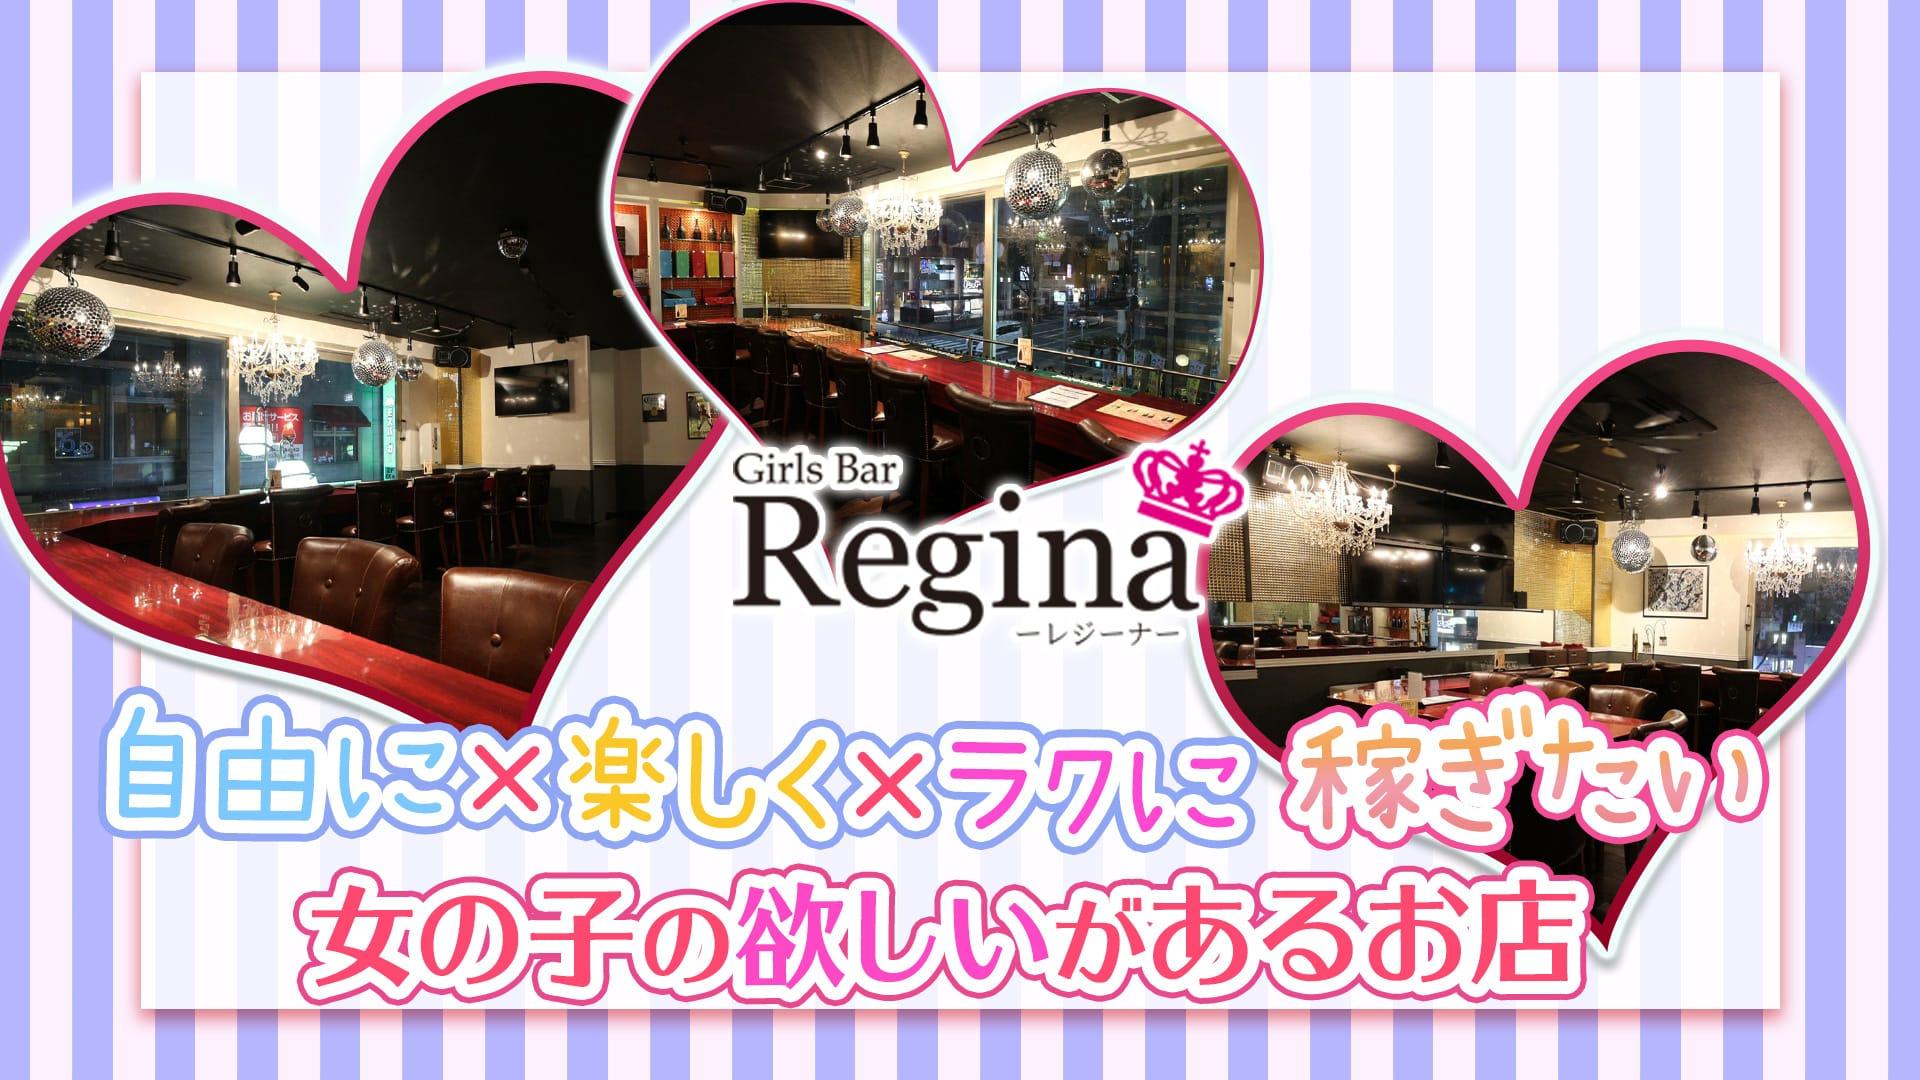 Girl's Bar Regina(レジーナ) 中洲ガールズバー TOP画像